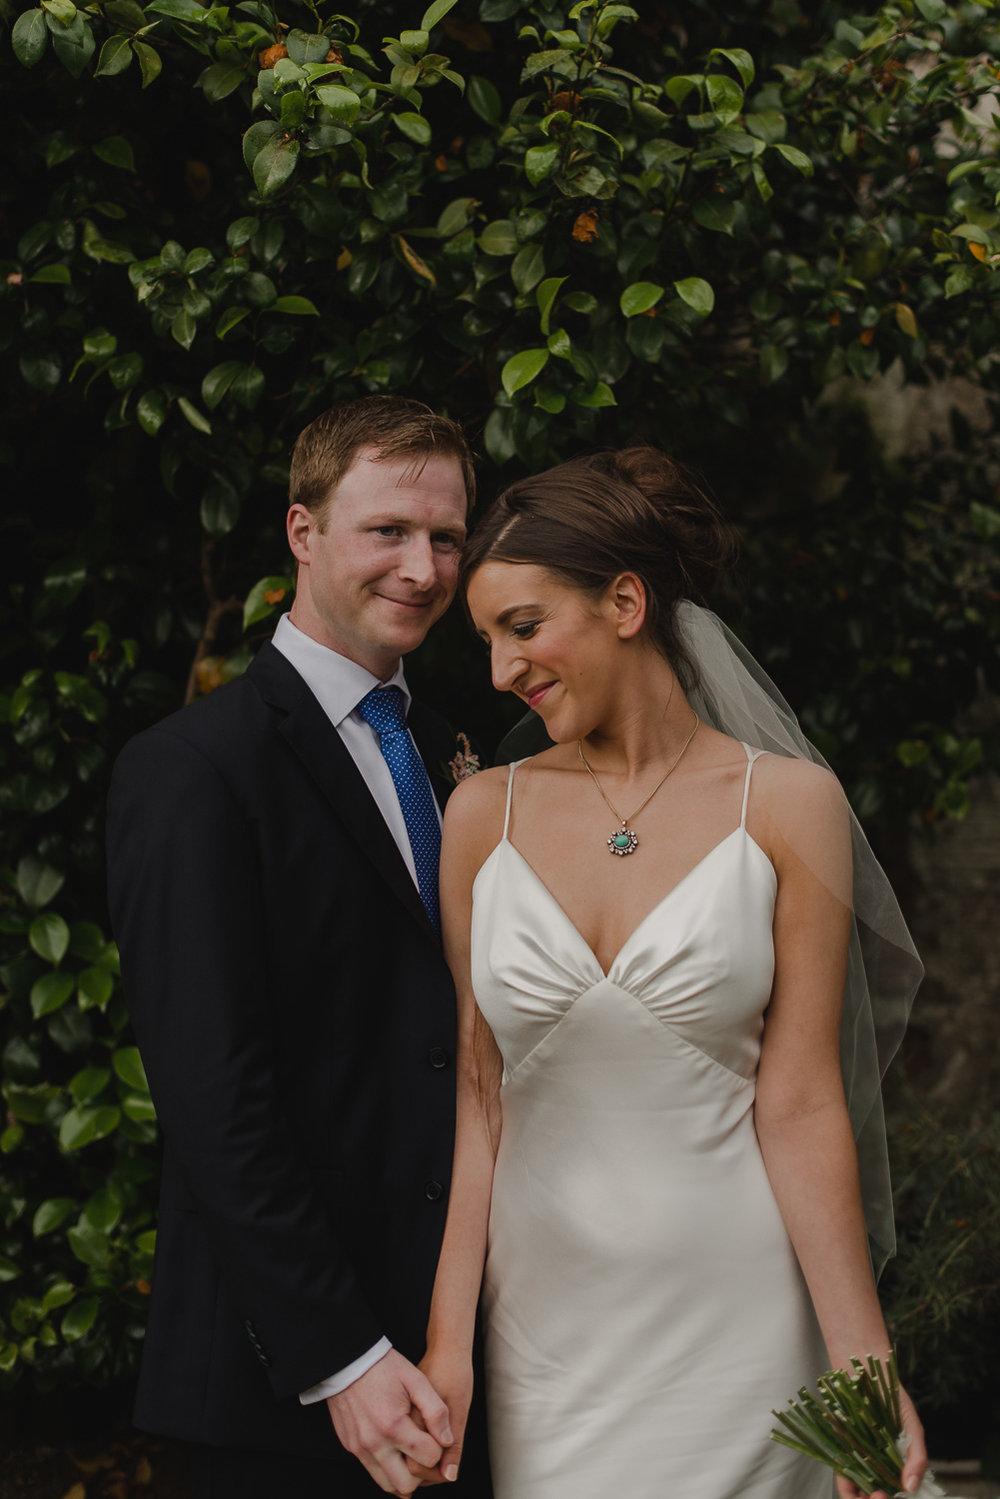 northern-ireland-wedding-photographer-esther-irvine-127.jpg